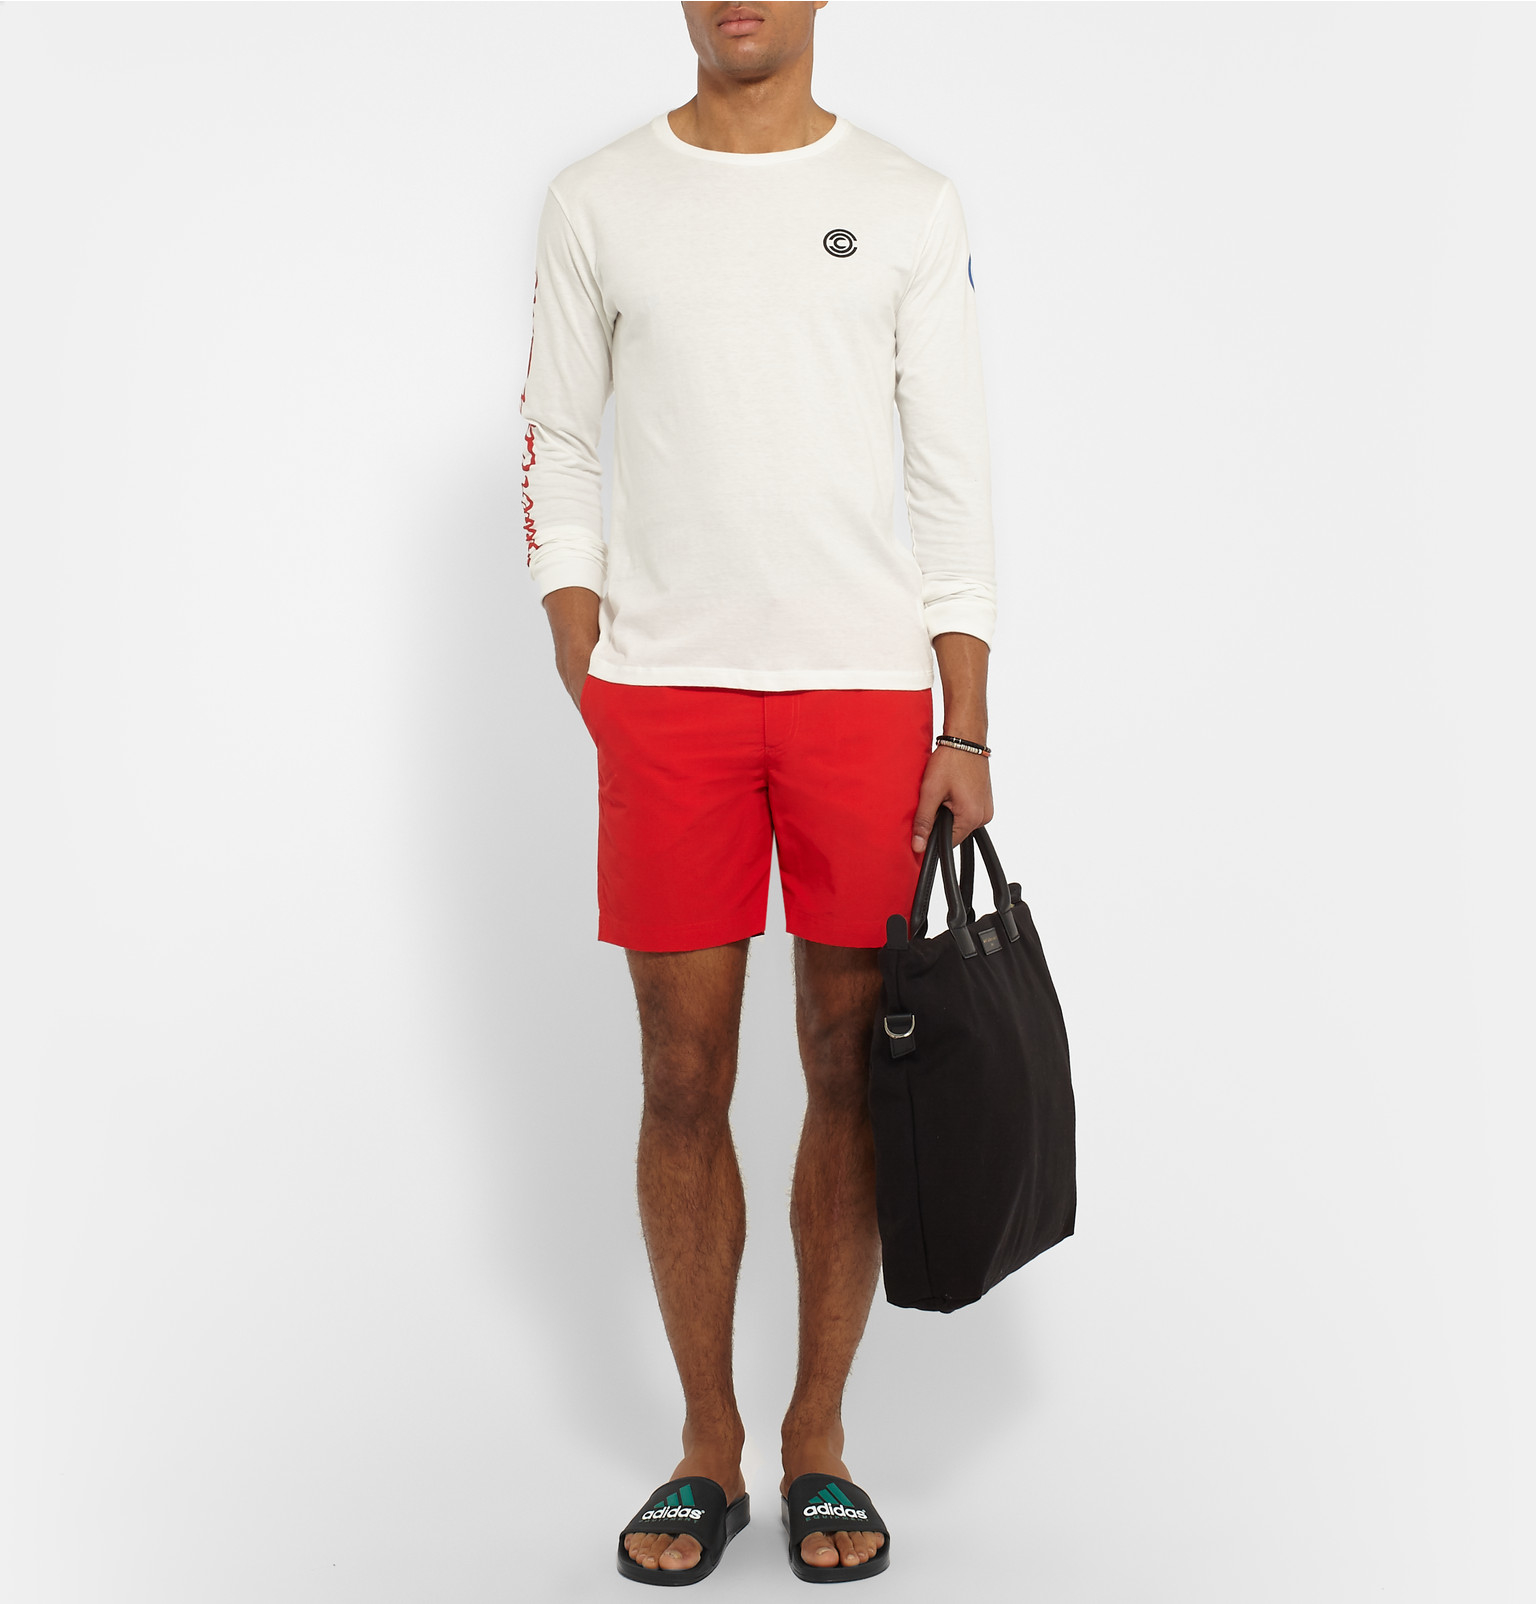 8404bf5717f08 adidas Originals Adilette Rubber Pool Slides in Black for Men - Lyst